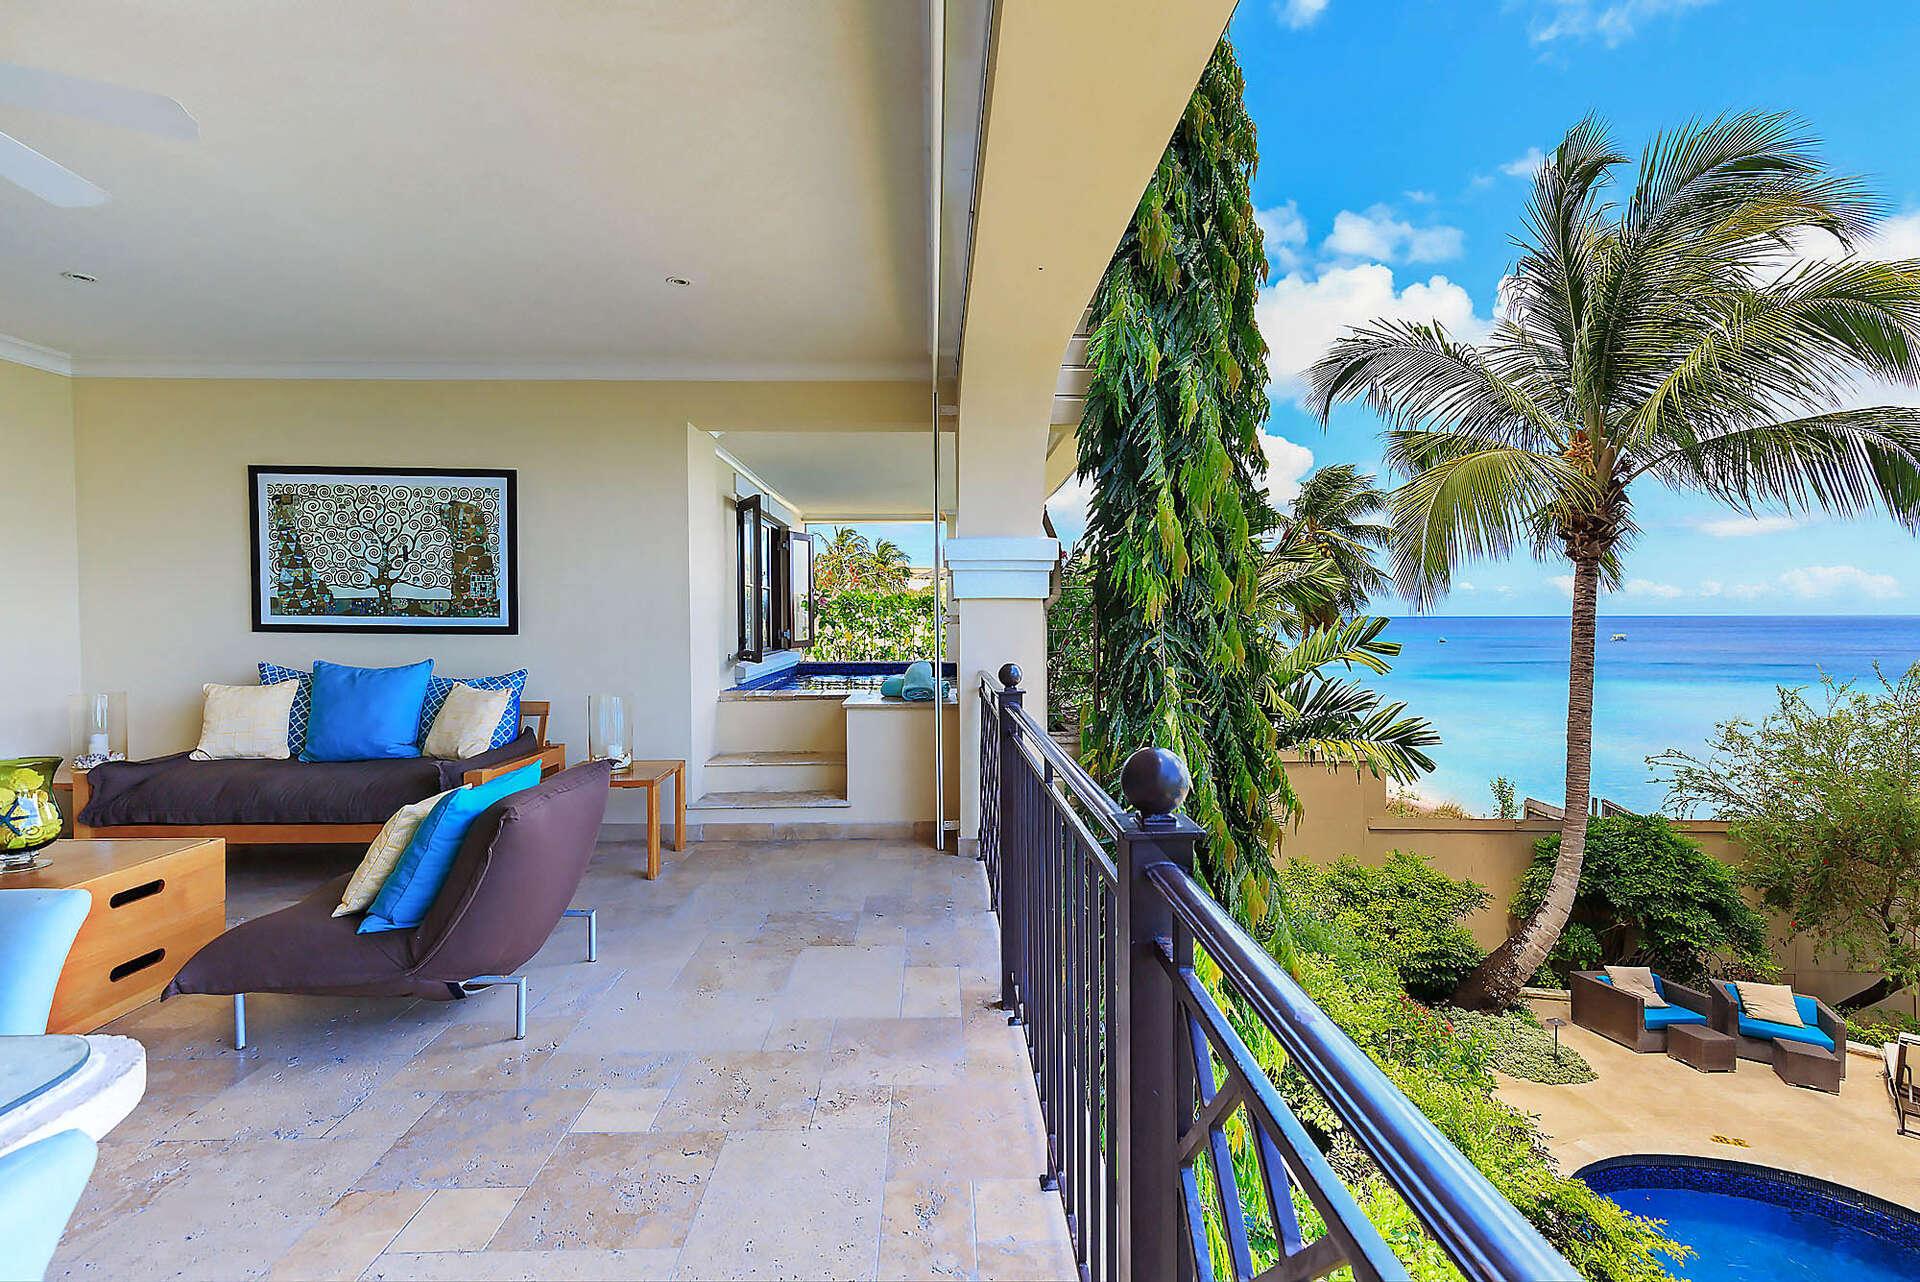 Luxury villa rentals caribbean - Barbados - St james - Derricks - Sandy Cove 201 | Paradise - Image 1/29